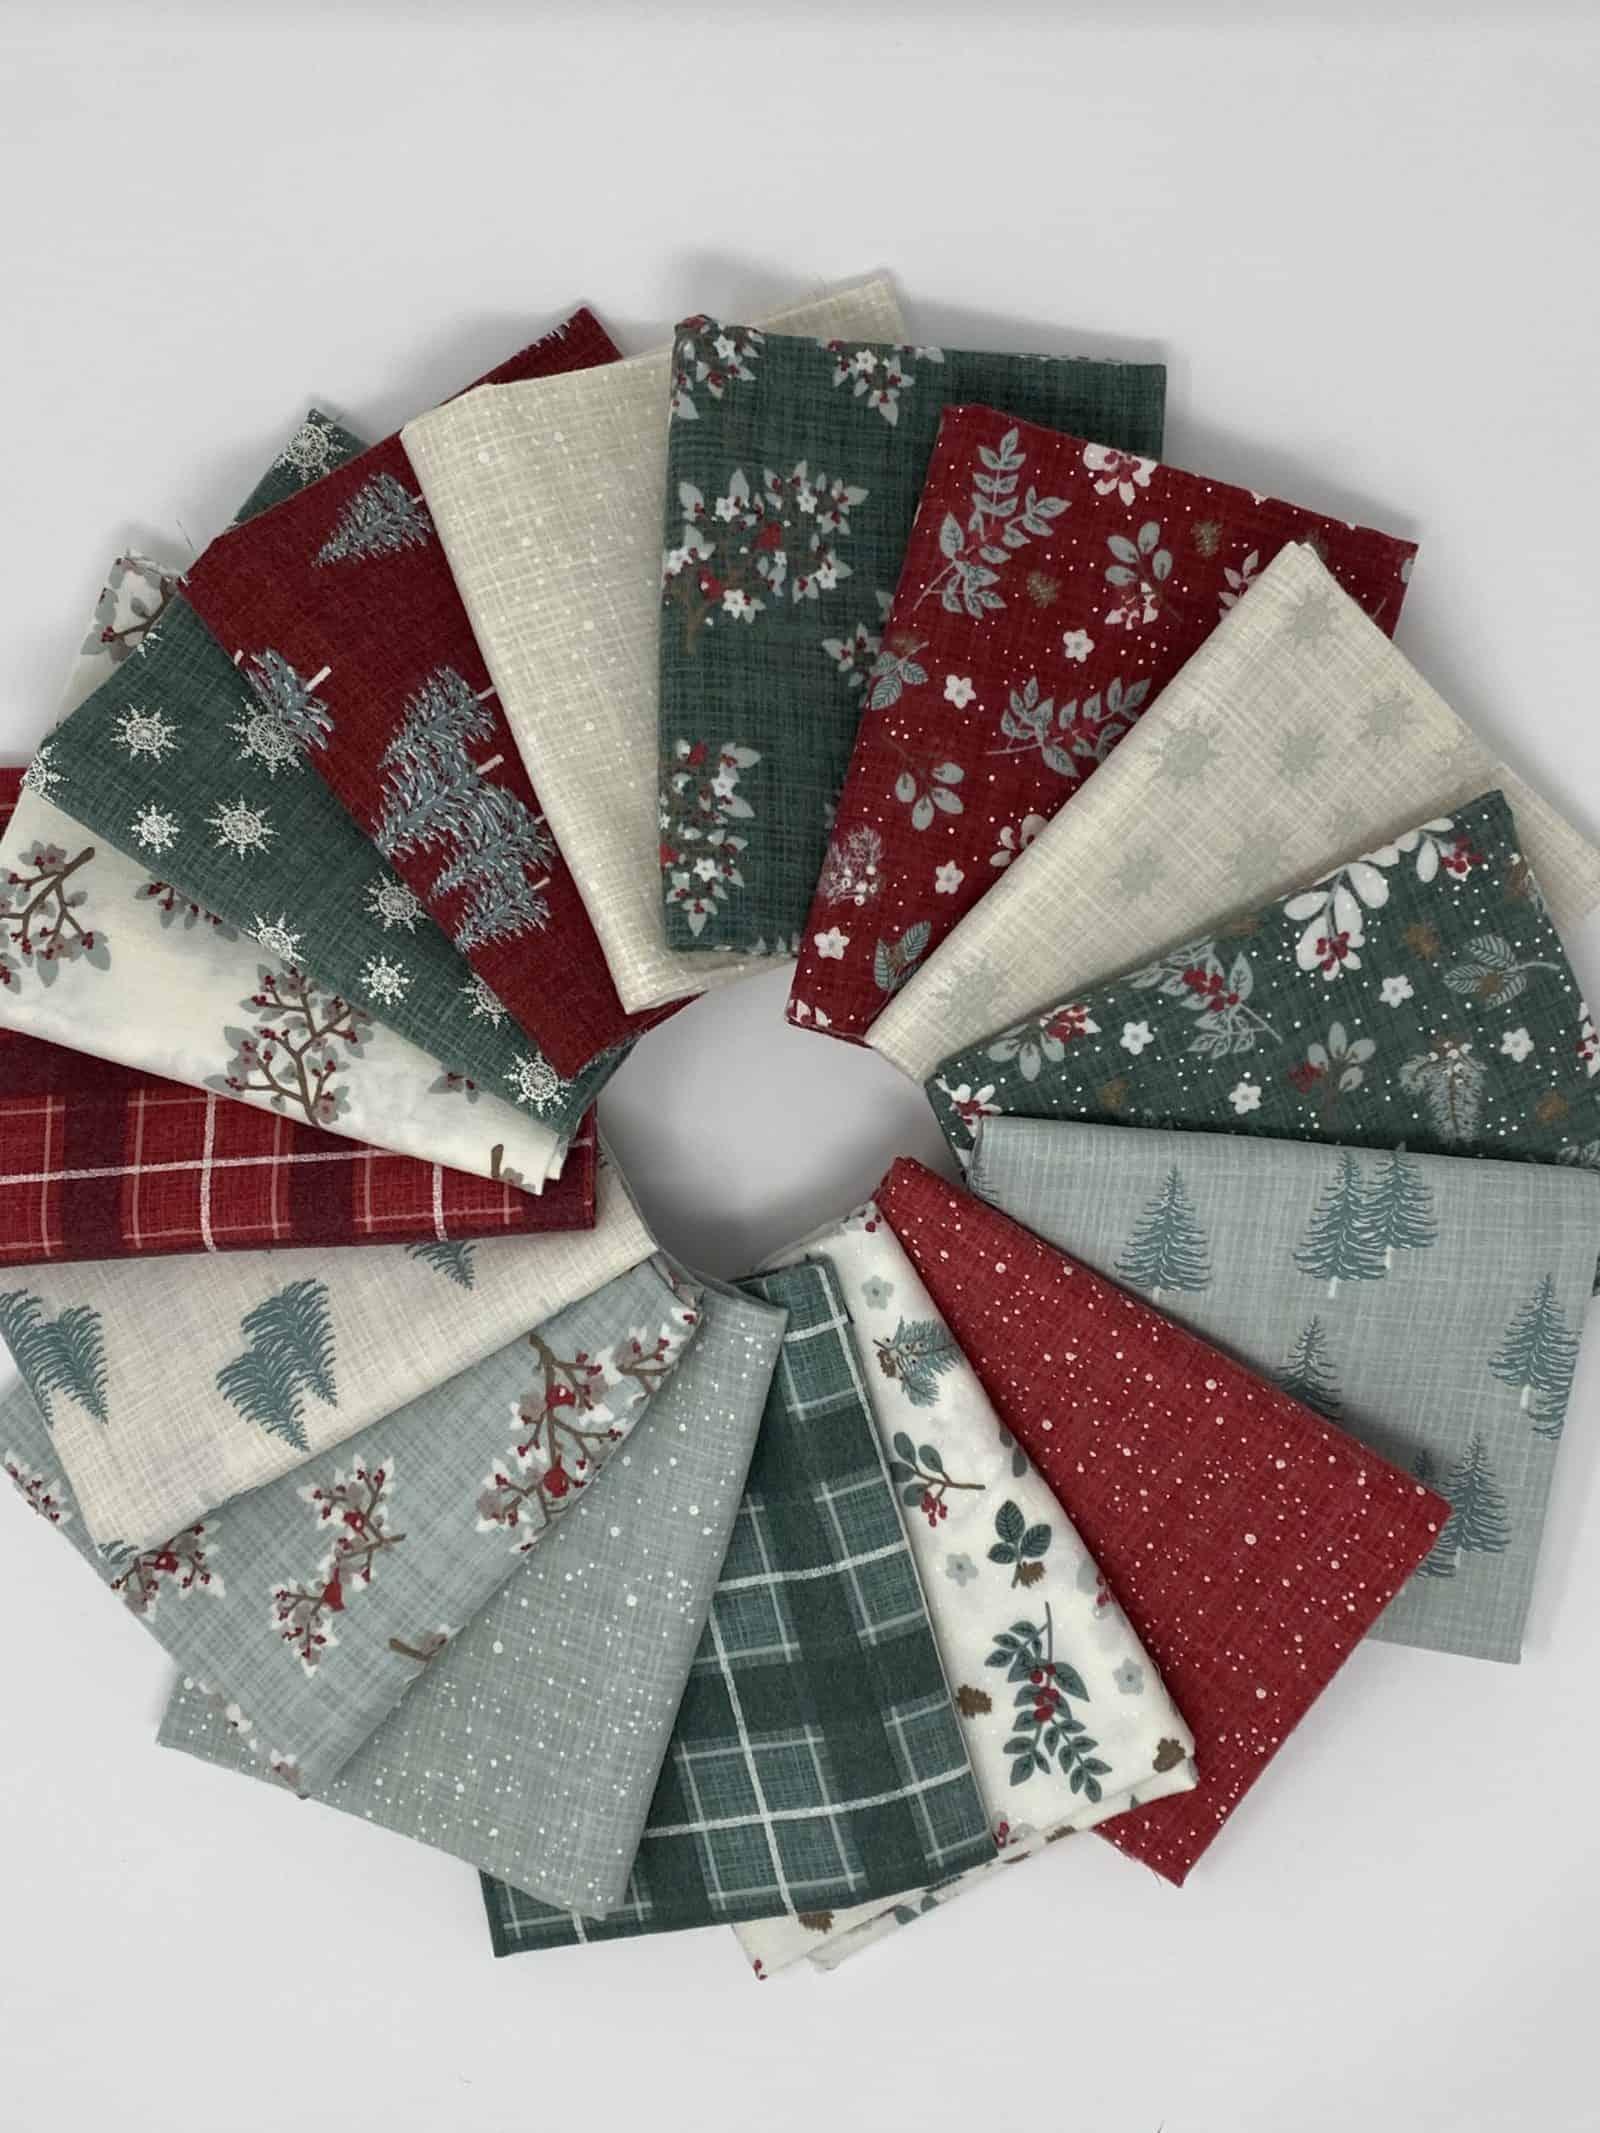 Juniper, Kate & Birdie, Brushed Cotton, Moda Fabrics